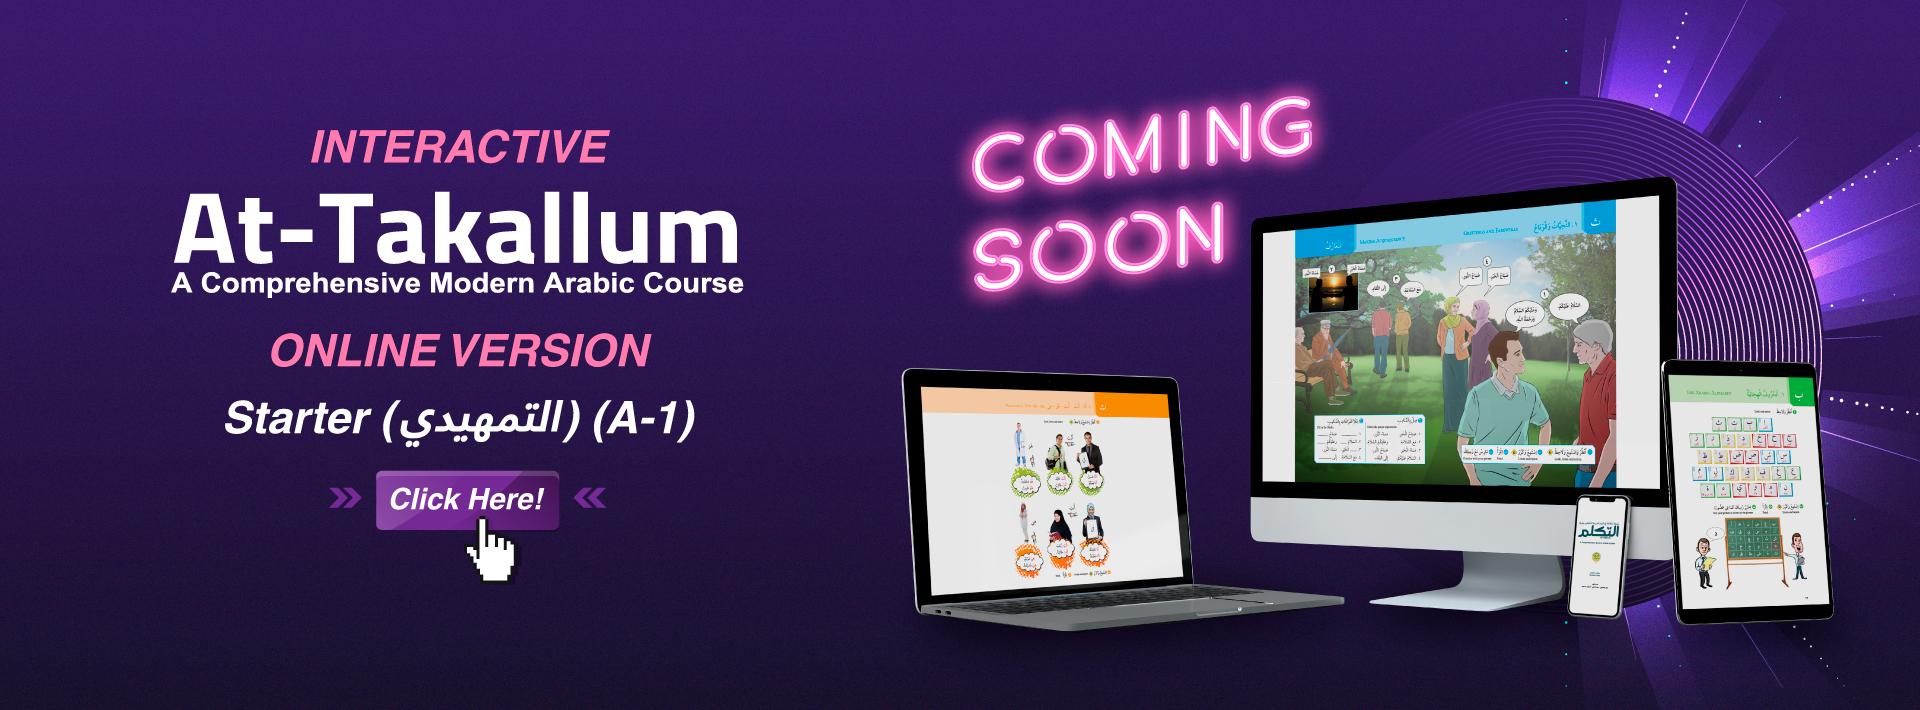 attakallum-comming-soon